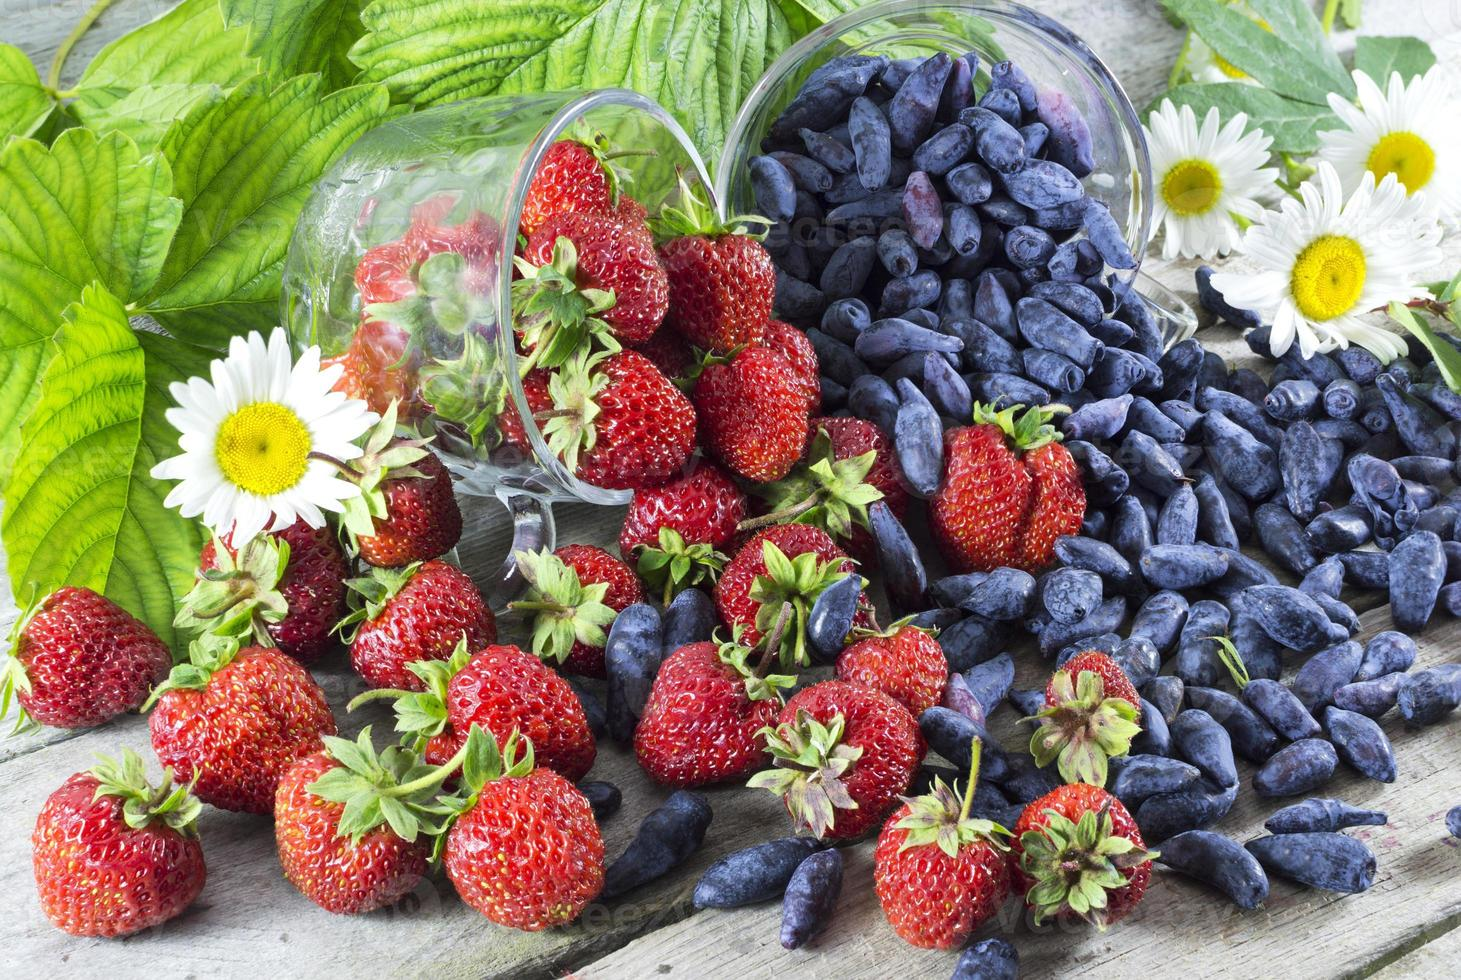 Summer berries photo